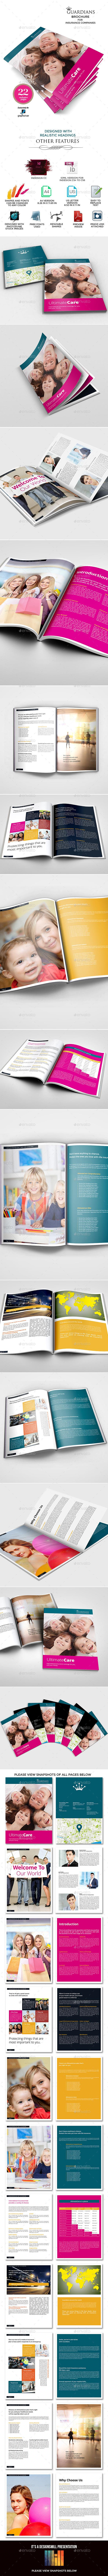 Insurance Companies Multipurpose Brochure Template - Informational Brochures